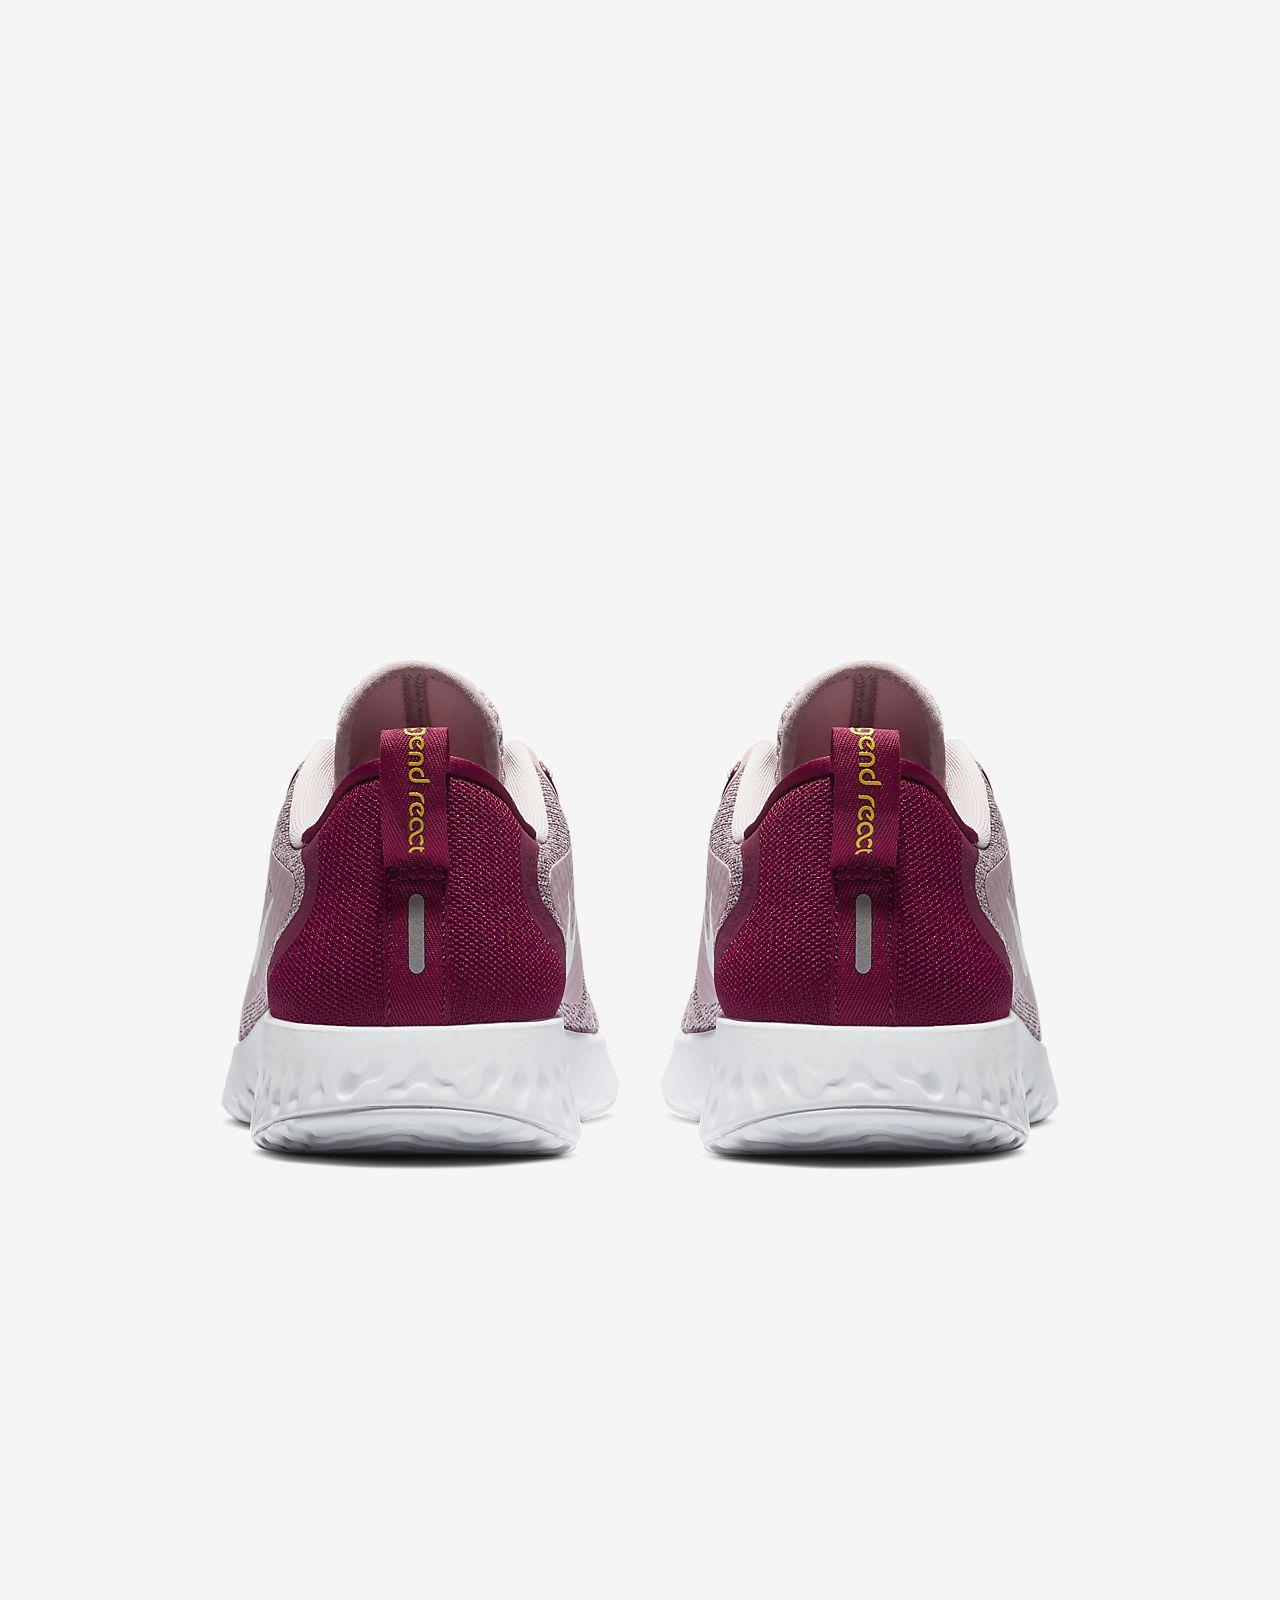 check out d31a2 c8675 ... Löparsko Nike Legend React för kvinnor